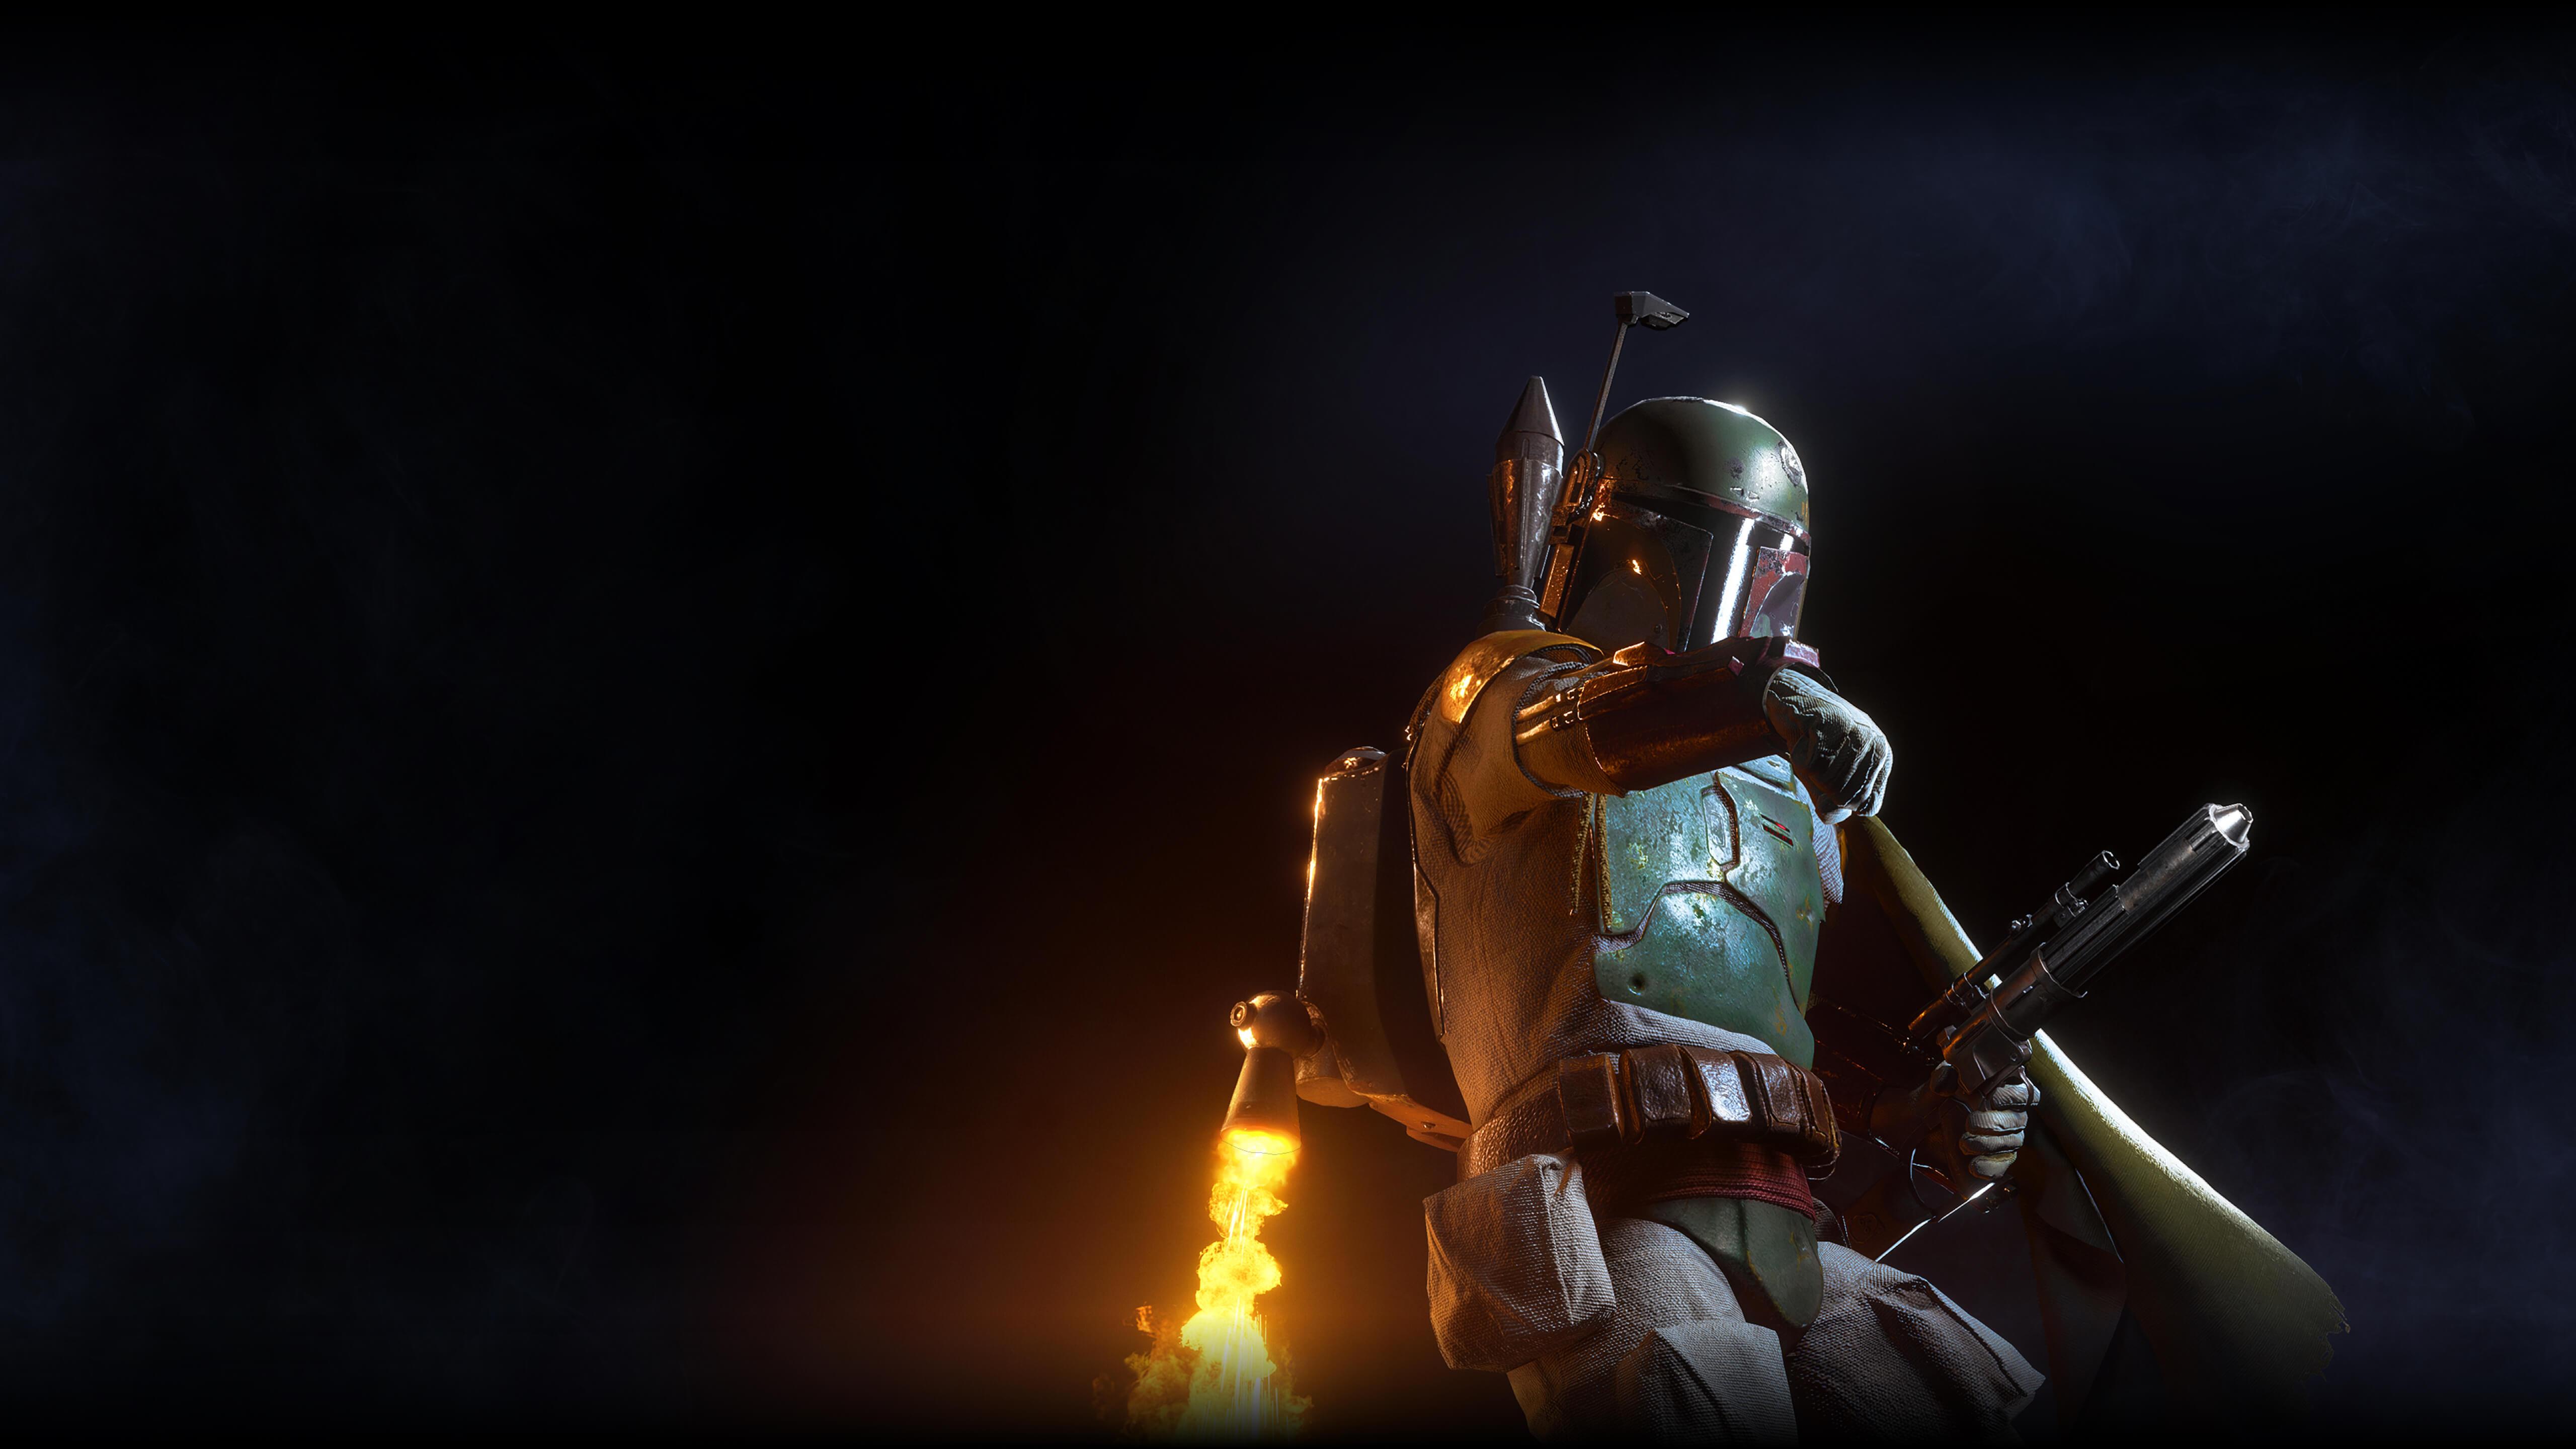 Free Download 2 Mandalorian Star Wars Hd Wallpapers